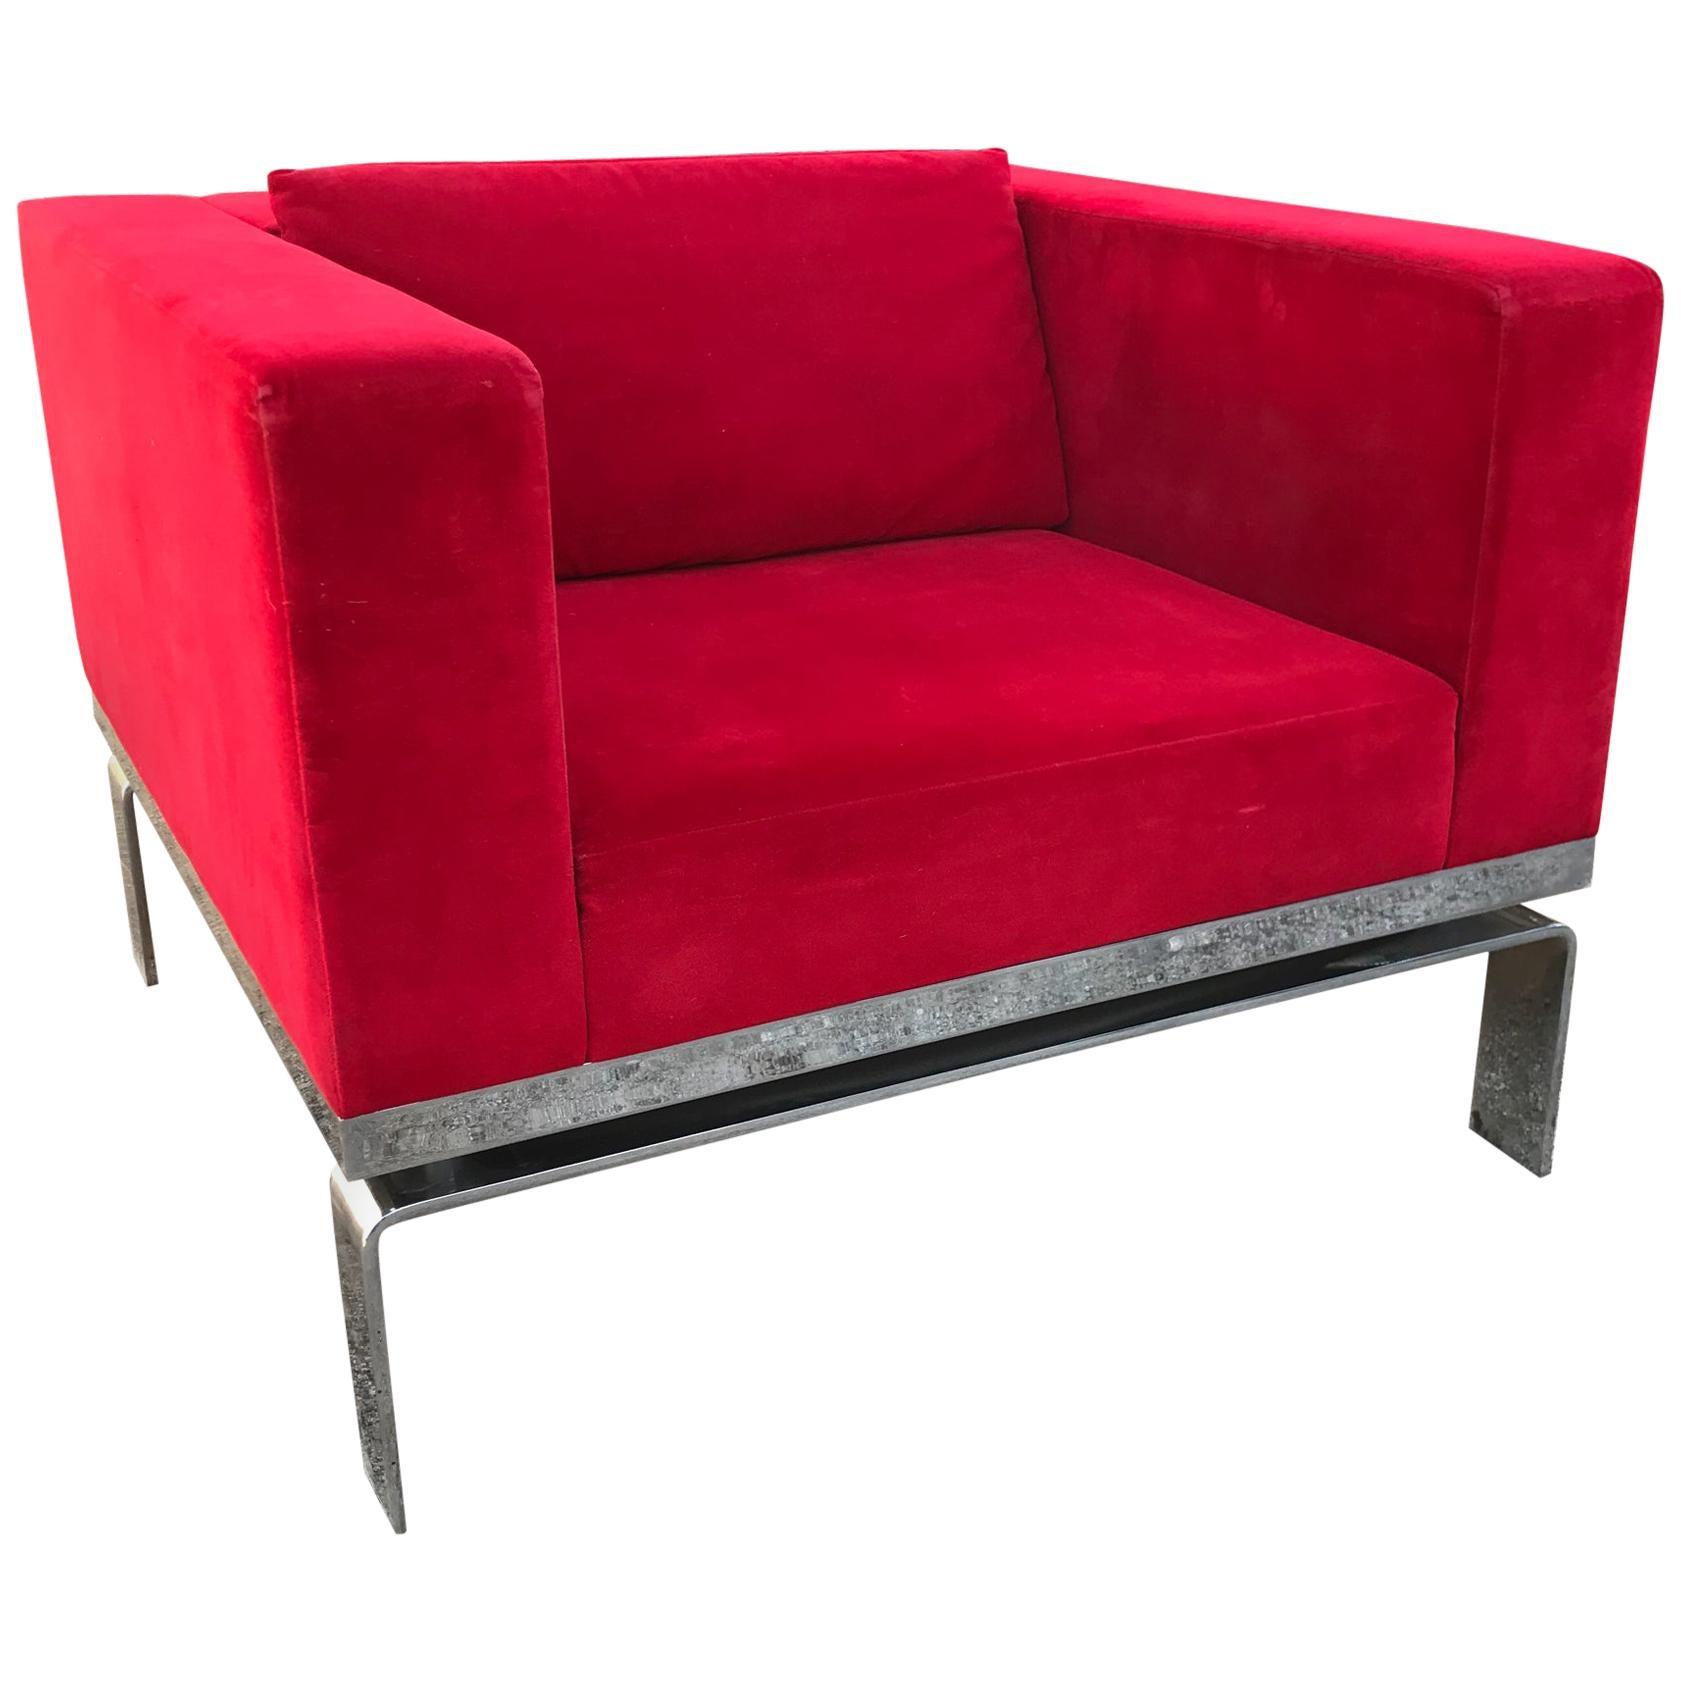 Martin Brattrud Lounge Chair Ferrari RED with Fabulous Chrome Base California